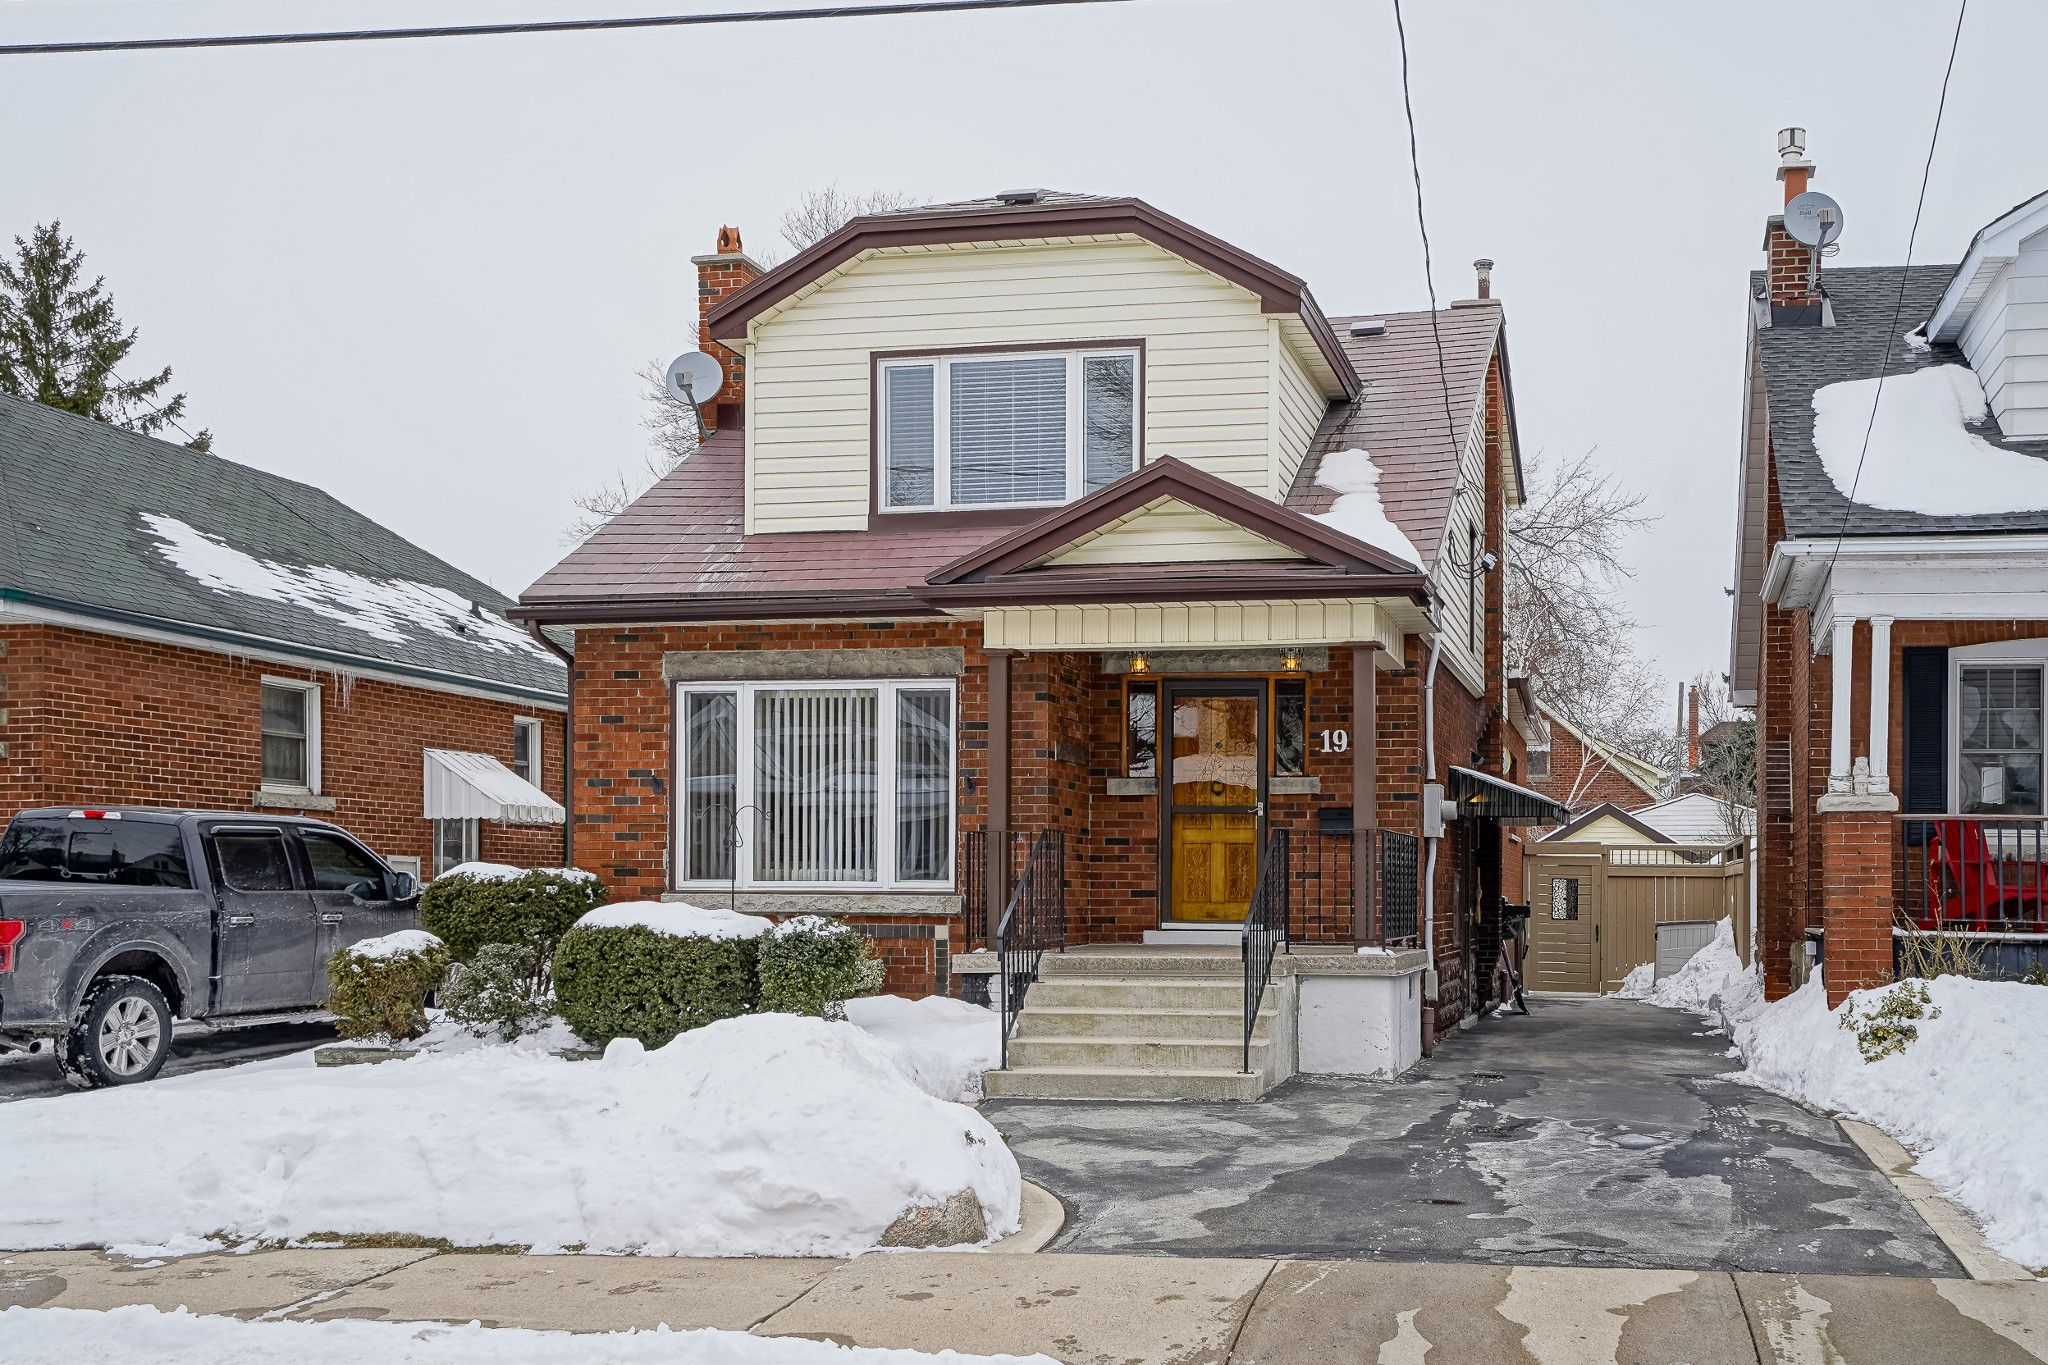 Main Photo: 17 Alpine Avenue in Hamilton: House for sale : MLS®# H4046661